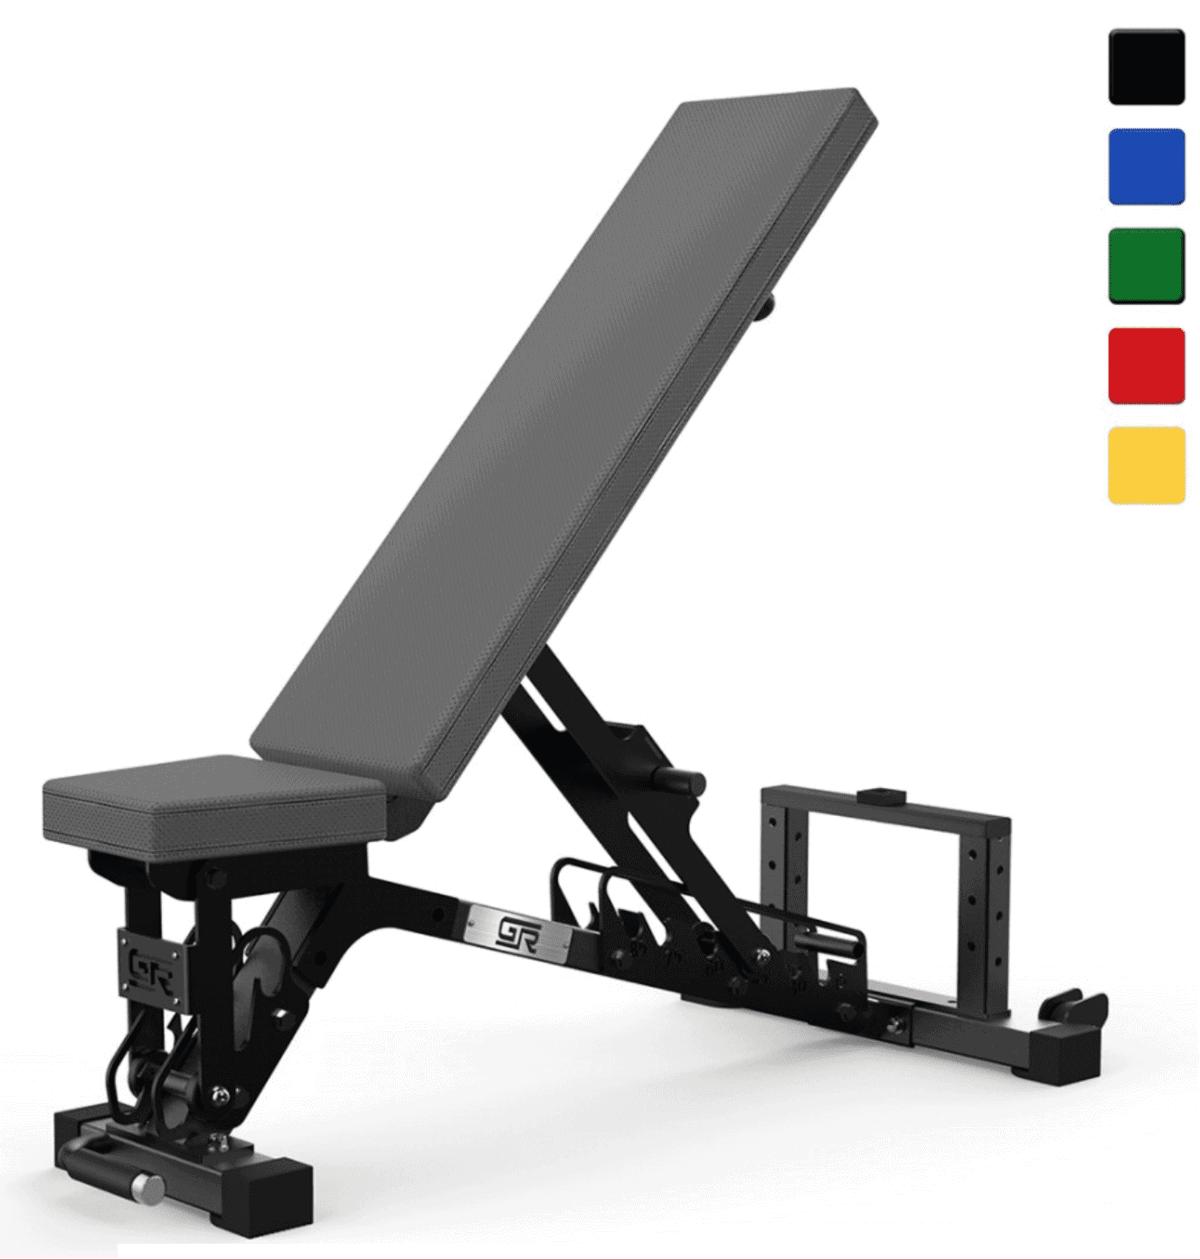 FIDAB-2 Adjustable Bench